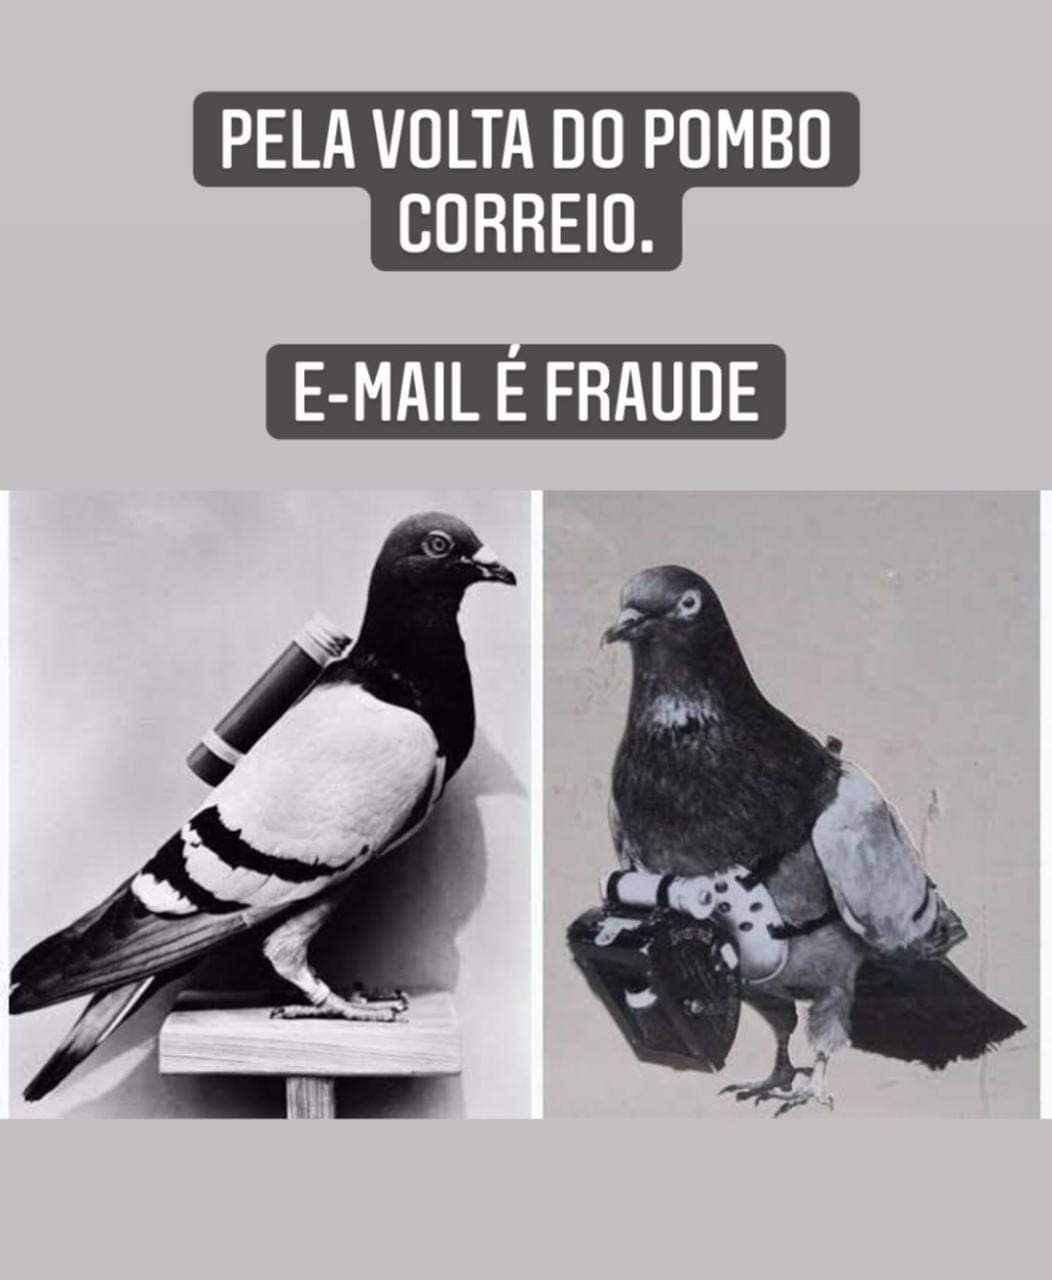 email e fraude volta pombo correio